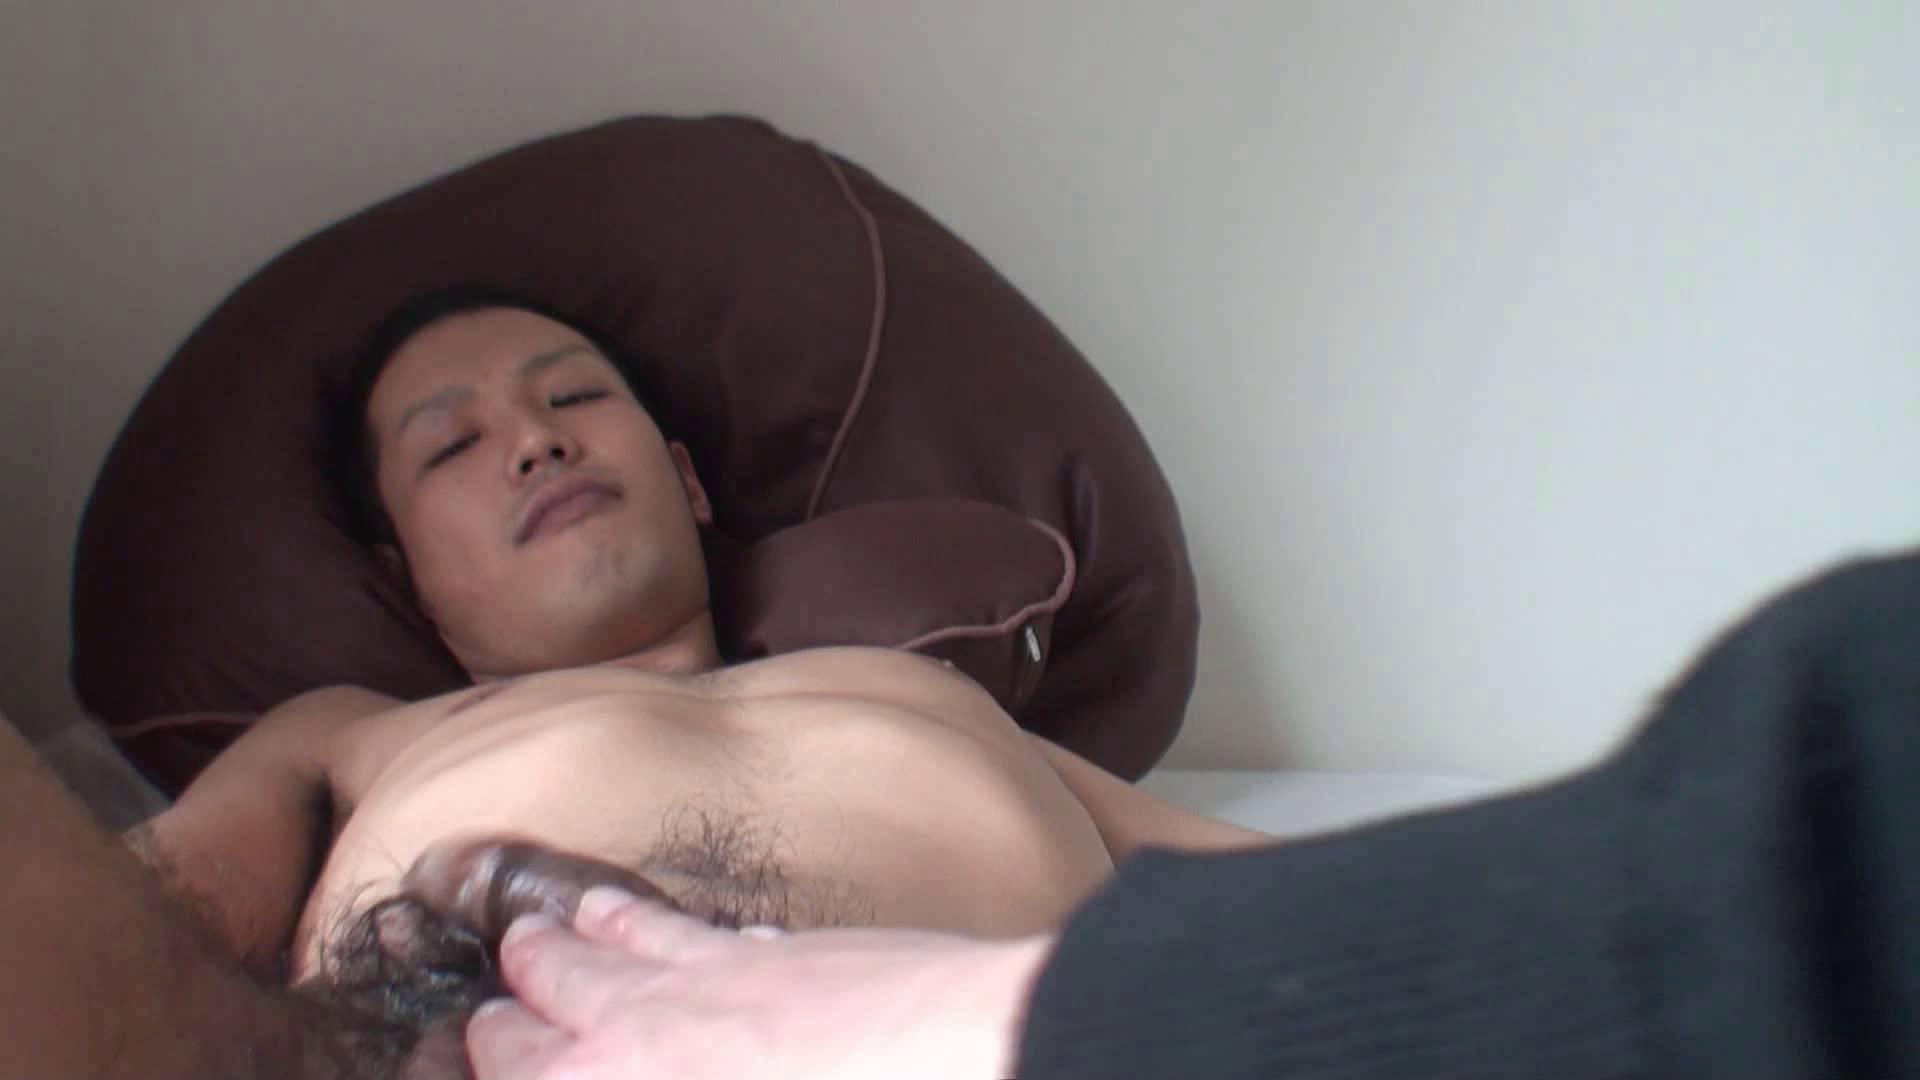 HD 良太と健二当たり前の日常 セックス編 男天国 | サル系ボーイズ  50pic 2